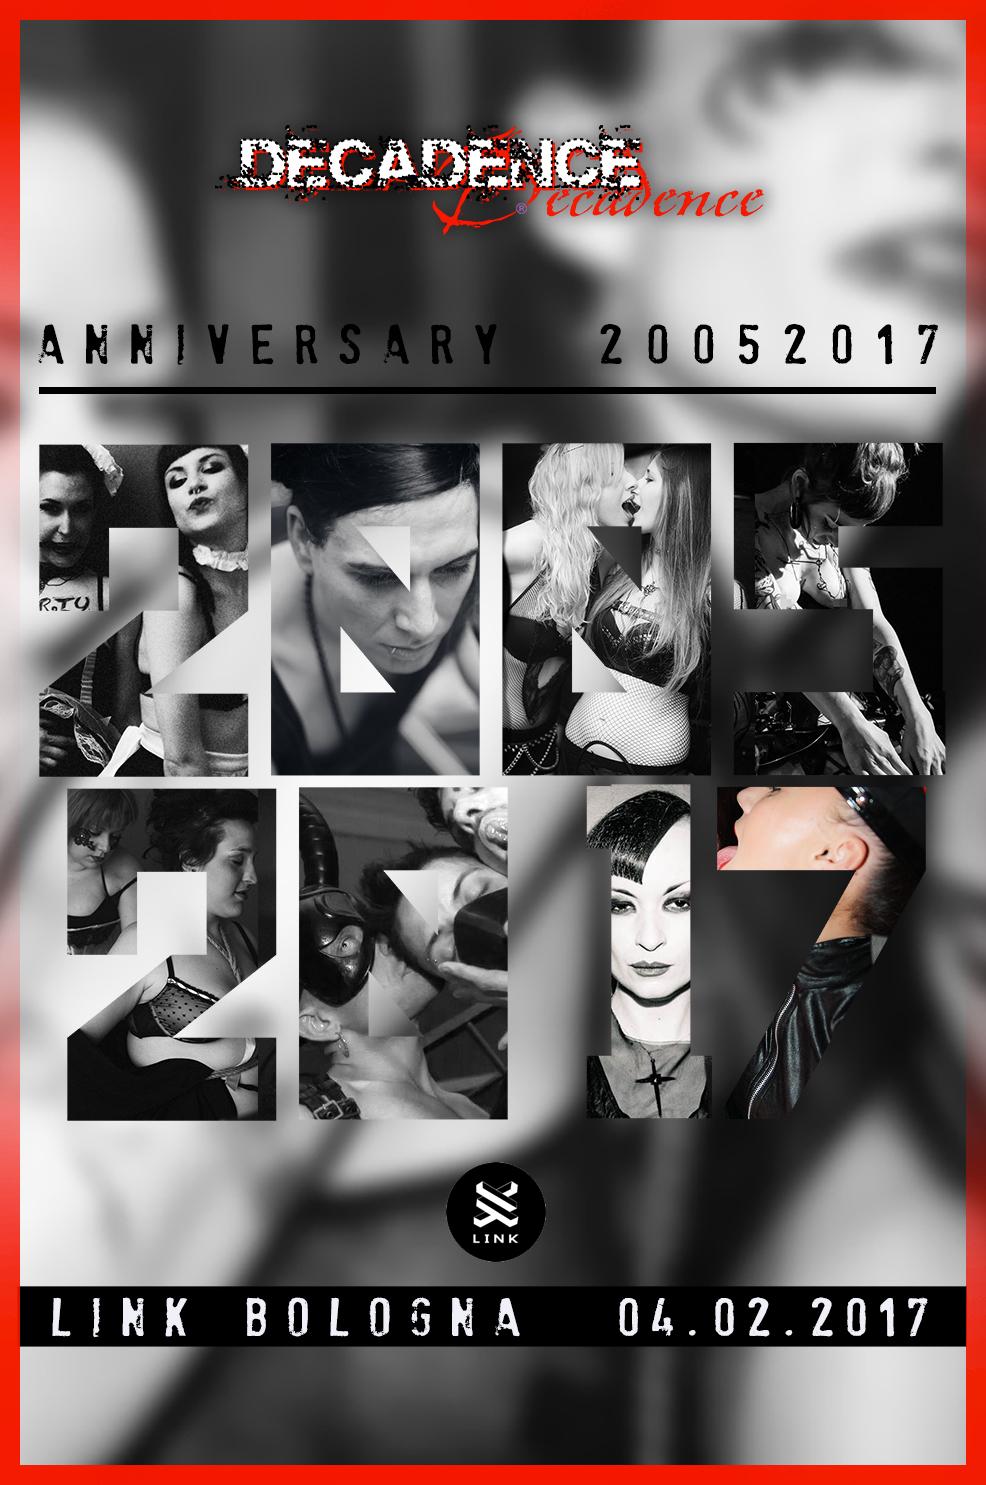 luca-anselmi-anniversary